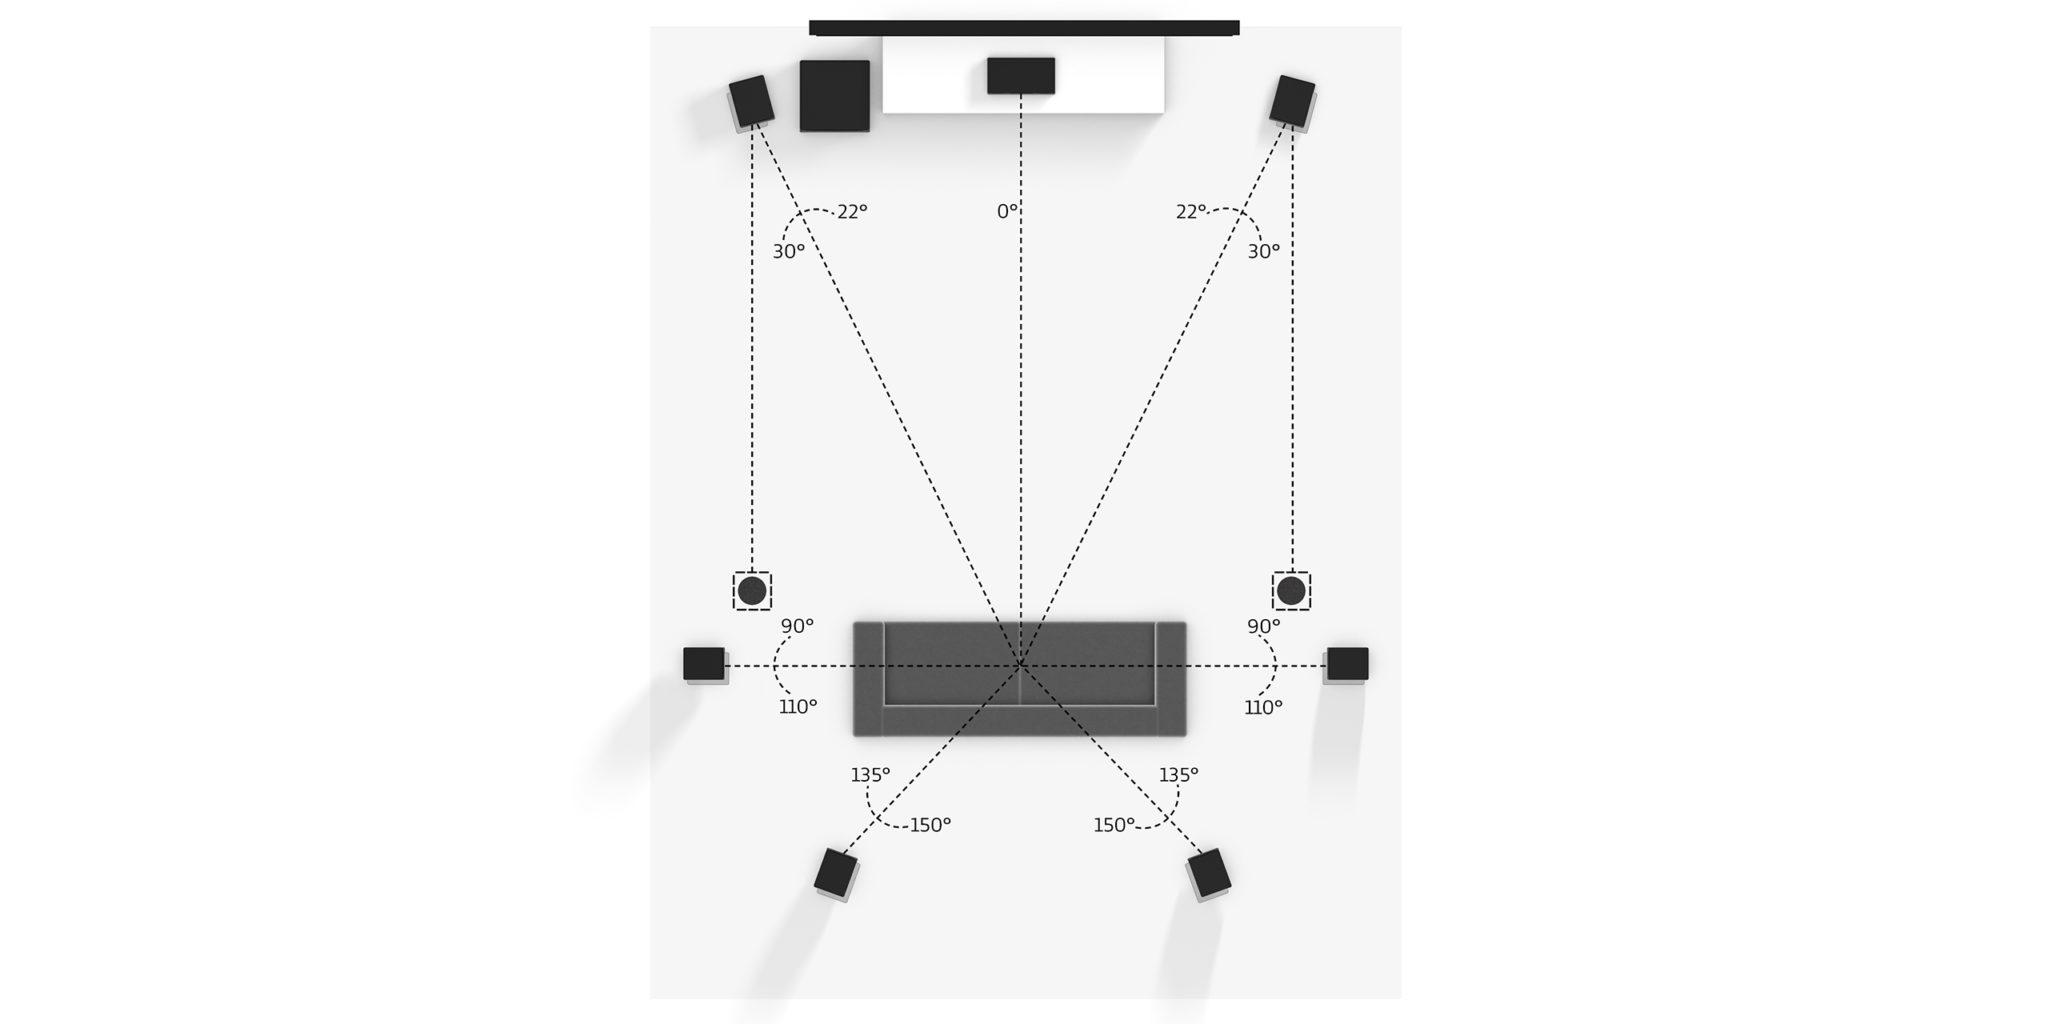 Speaker System For Home Theater